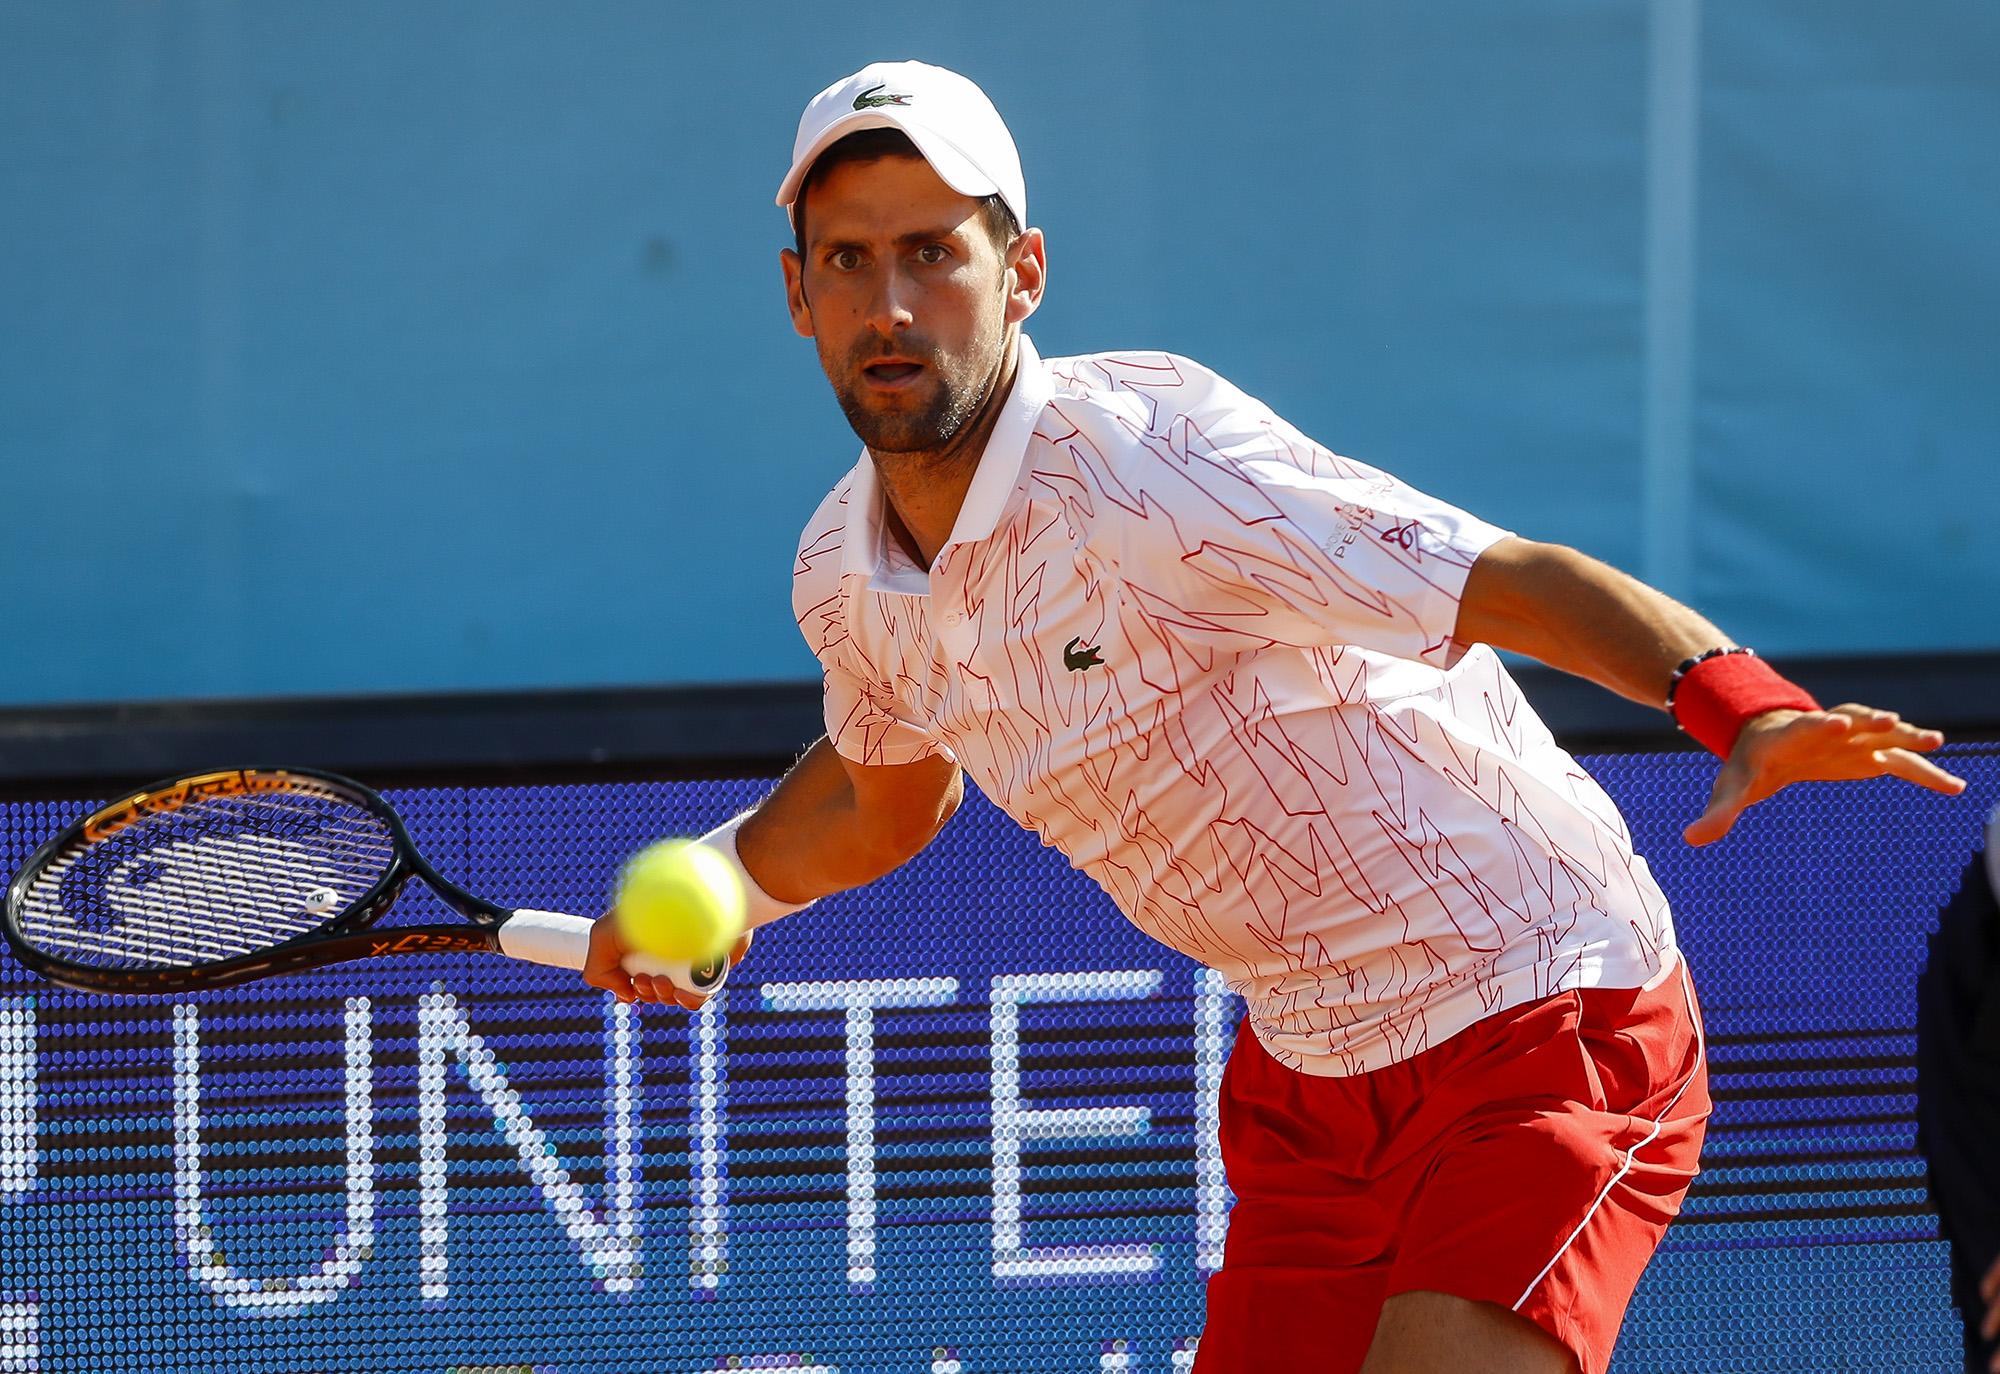 Adria Tournament Tennis